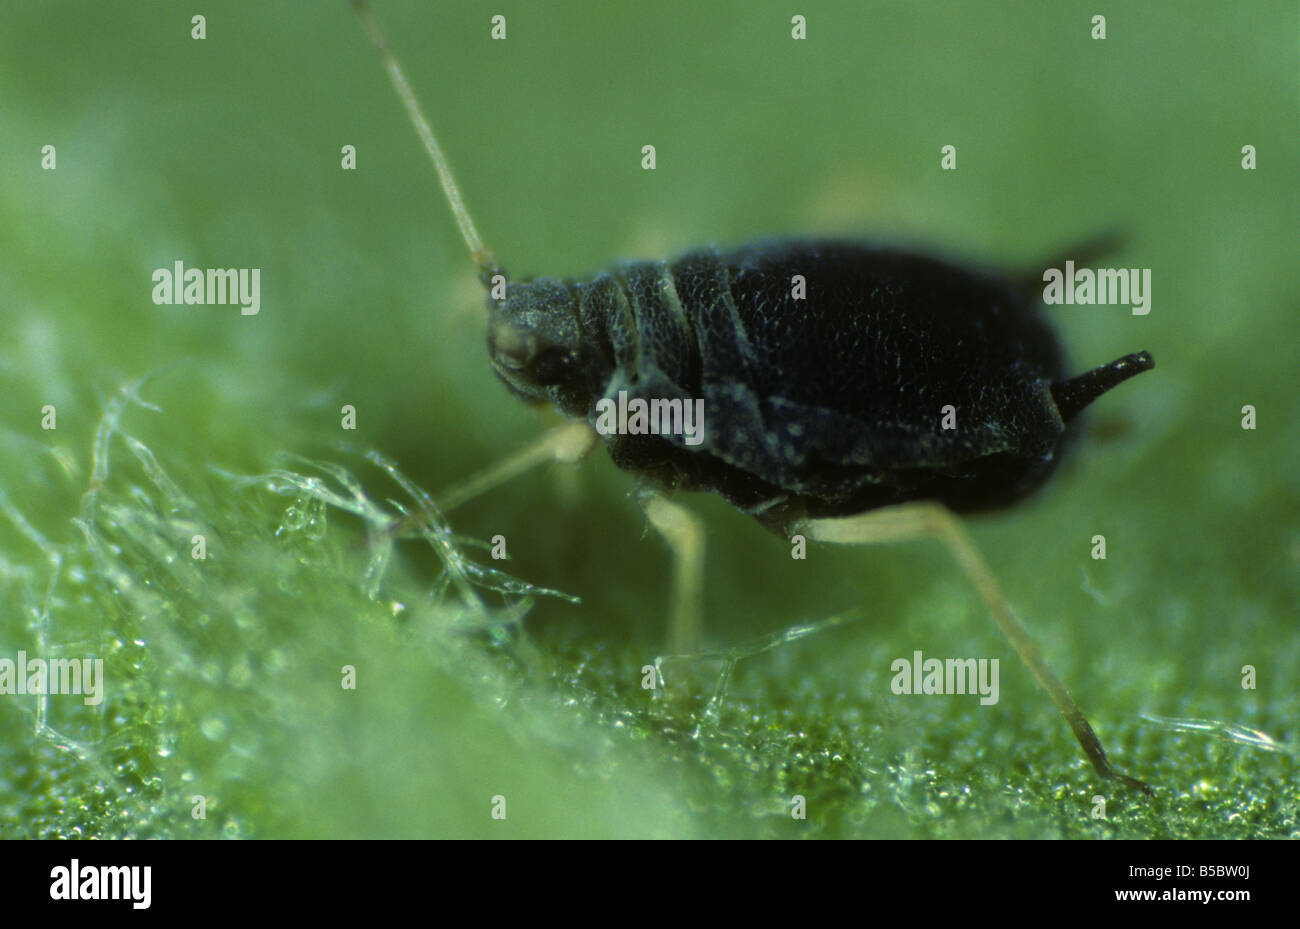 cotton aphid Aphis gossypii wingless adult - Stock Image